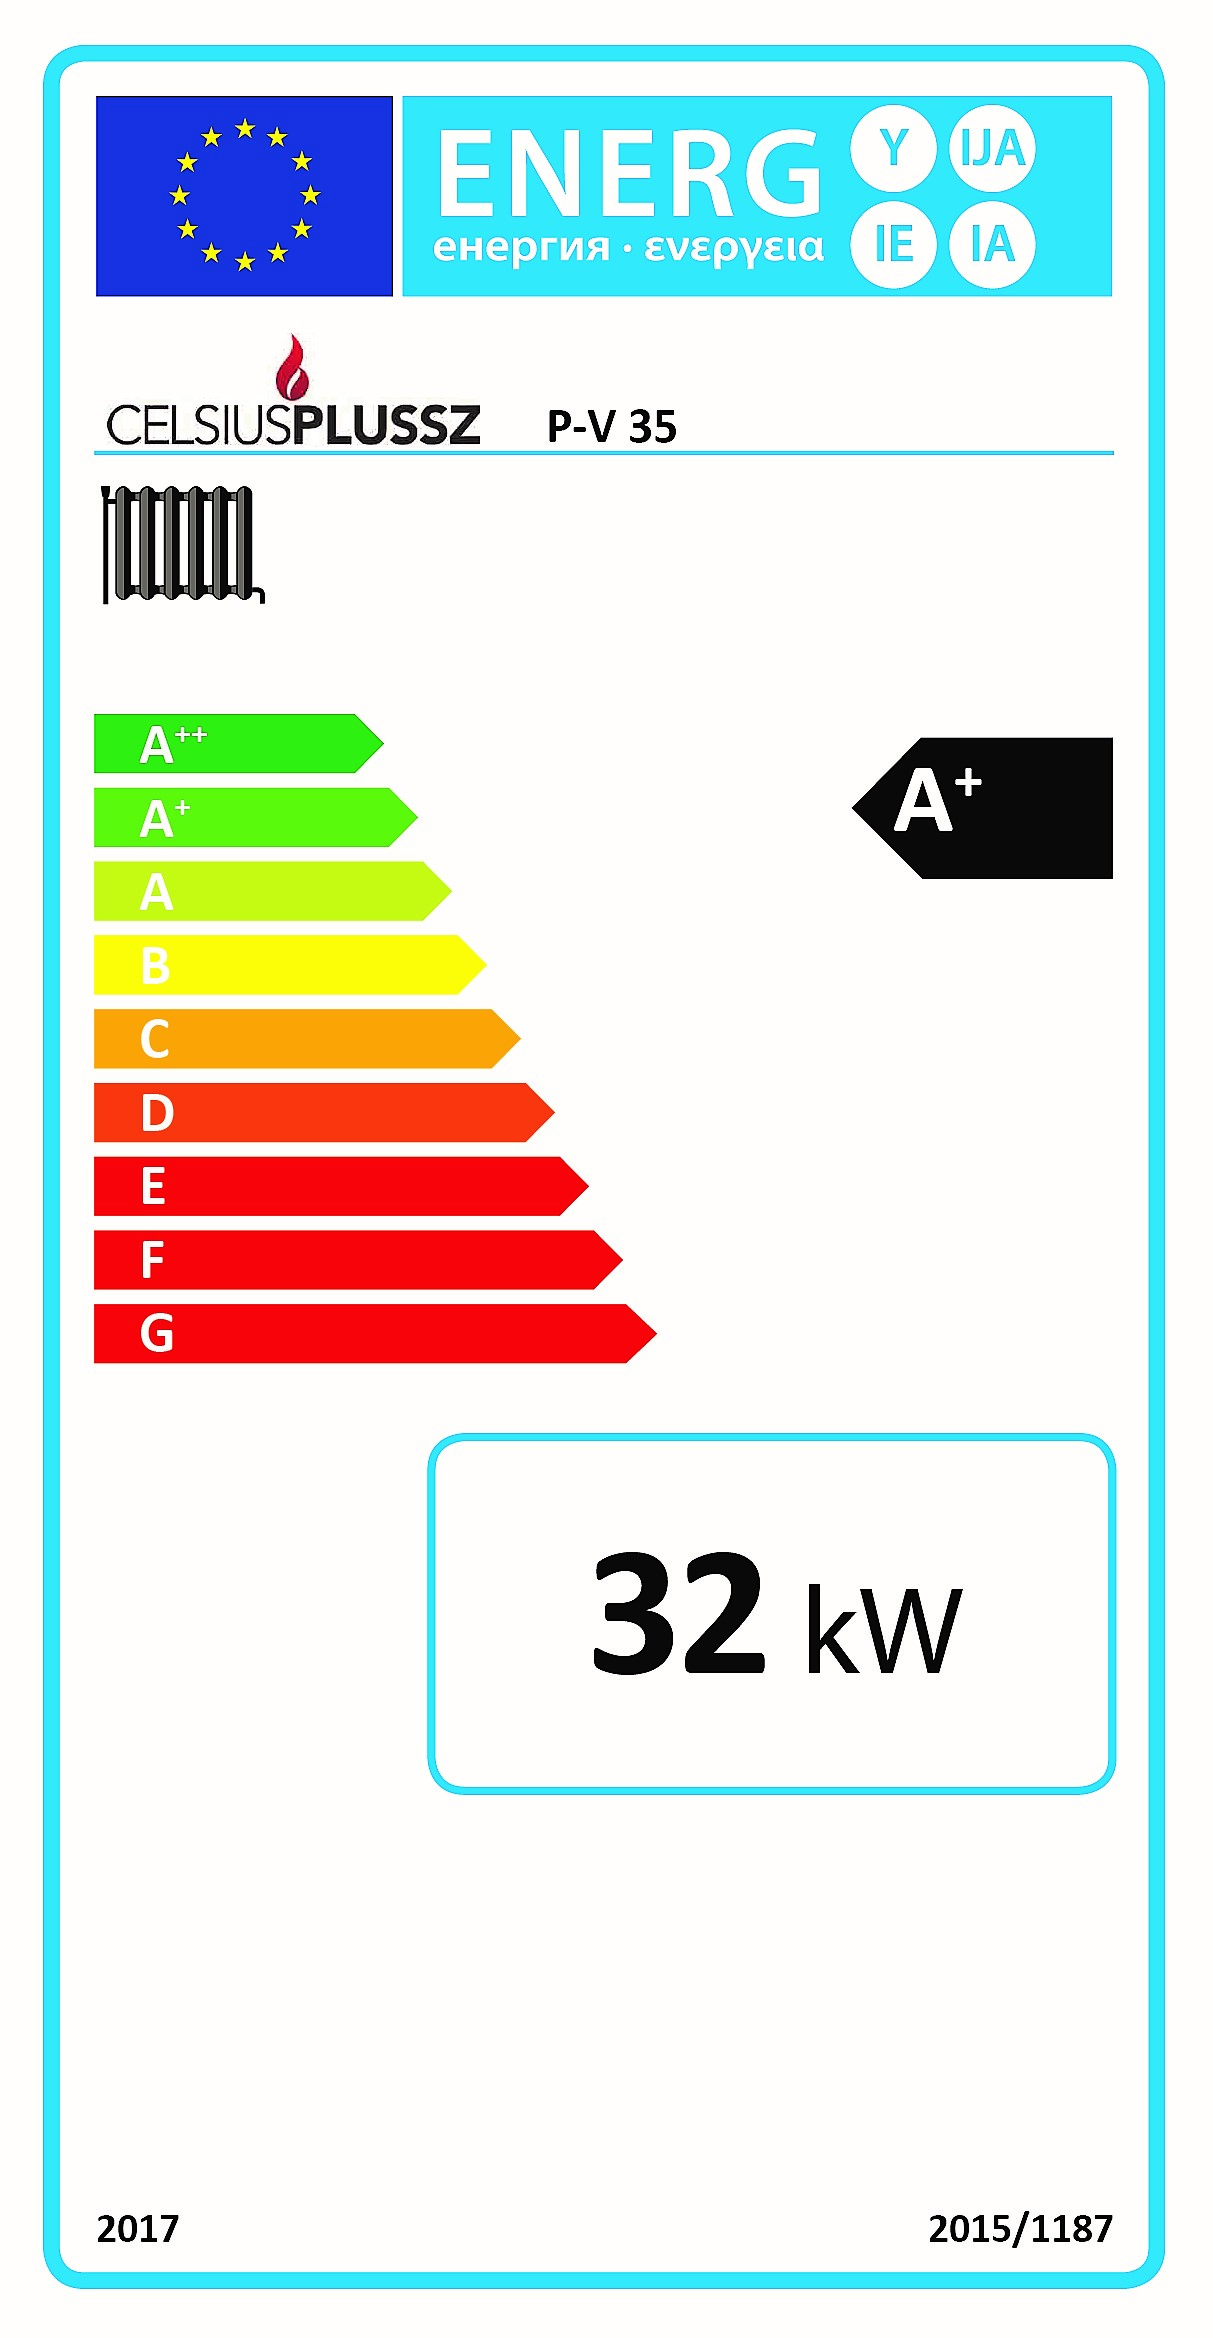 Celsius P-V 35 energiacímke